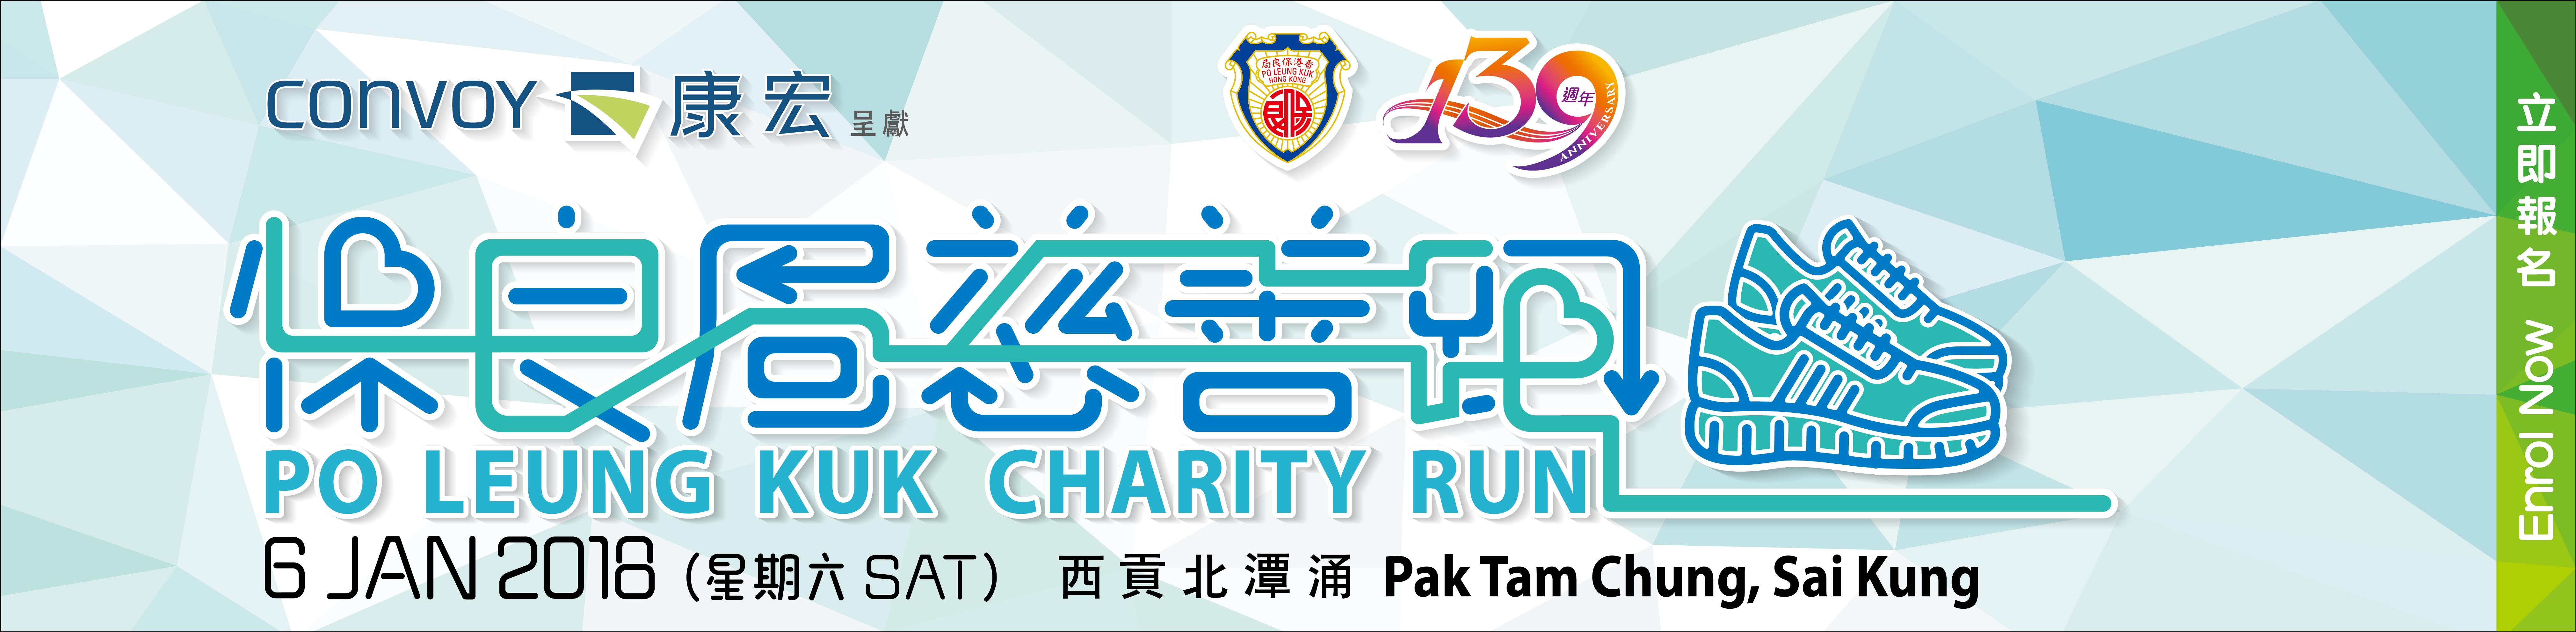 Convoy Financial Group Presents: Po Leung Kuk Charity Run